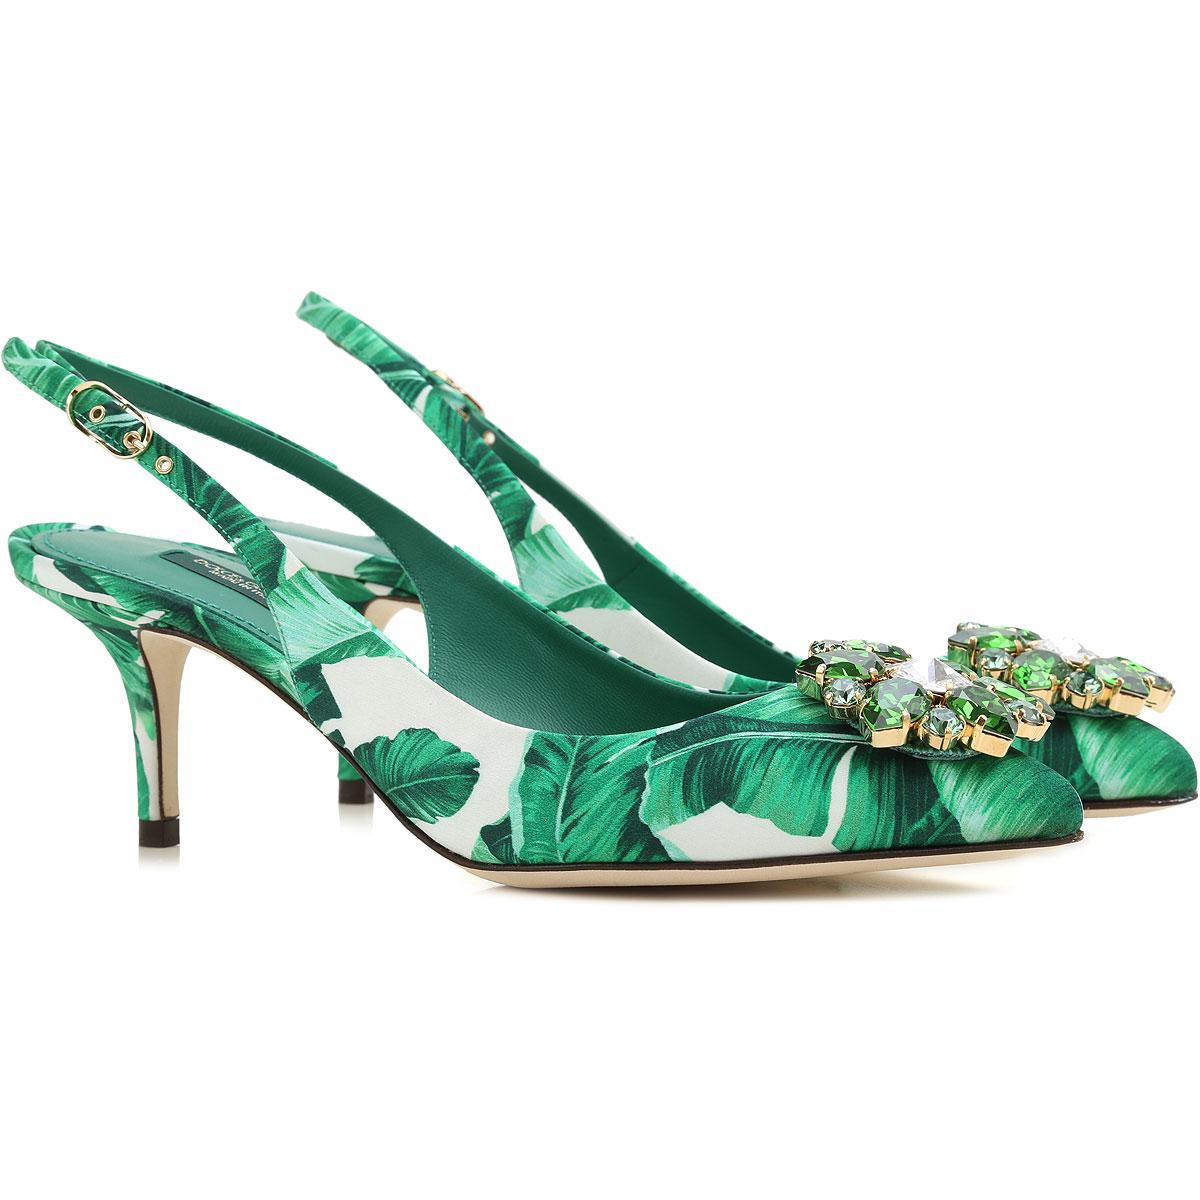 Womens Shoes Dolce  Gabbana Style code cg0013ae076hw005 363717